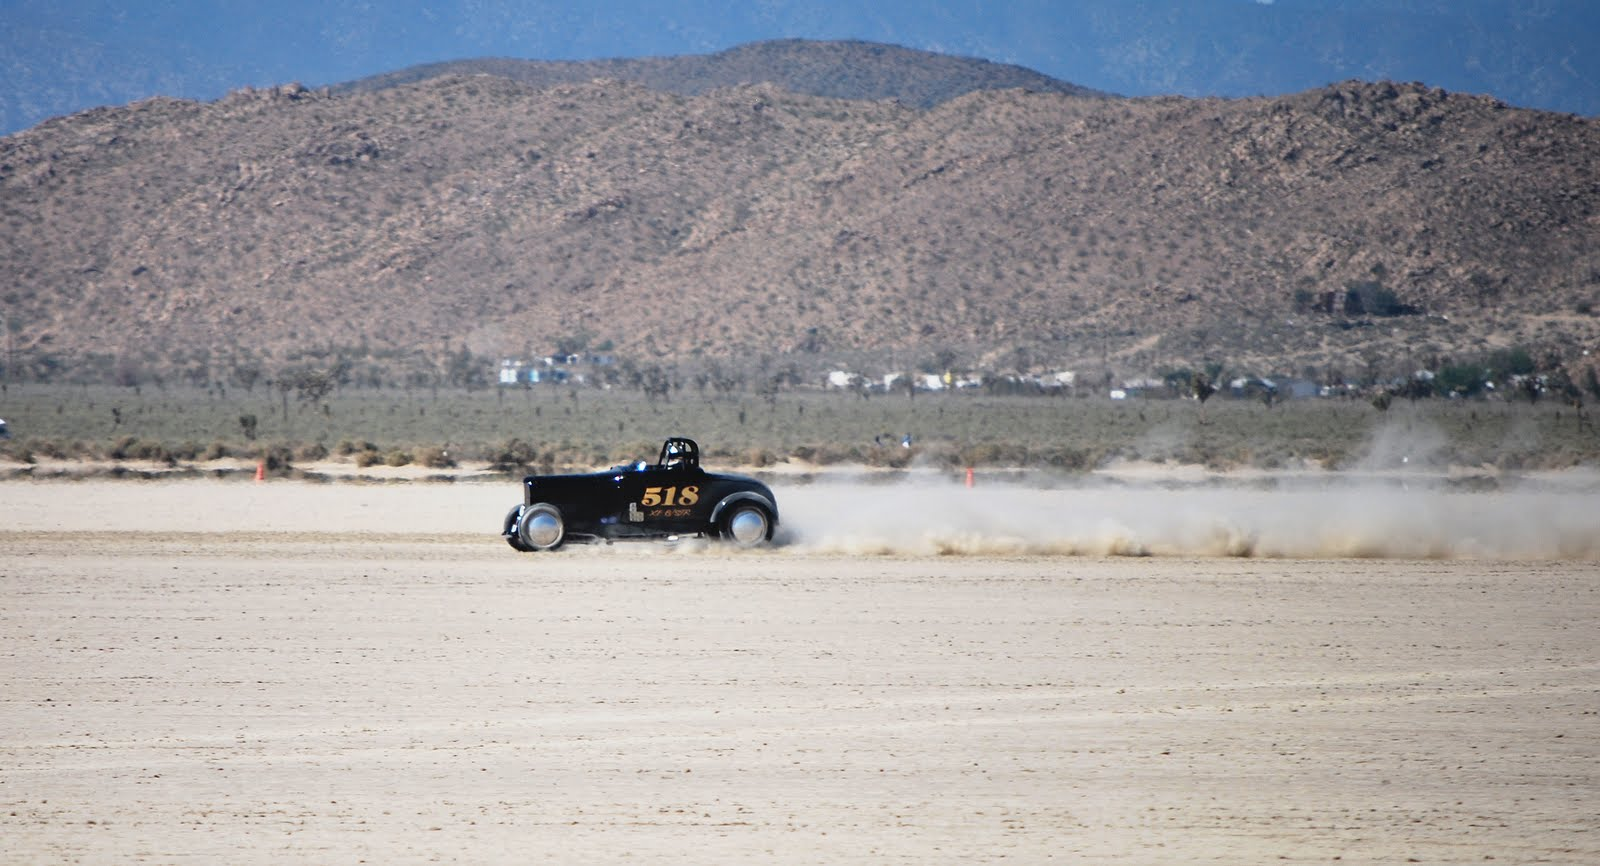 el mirage dry lake bed racing - photo #11